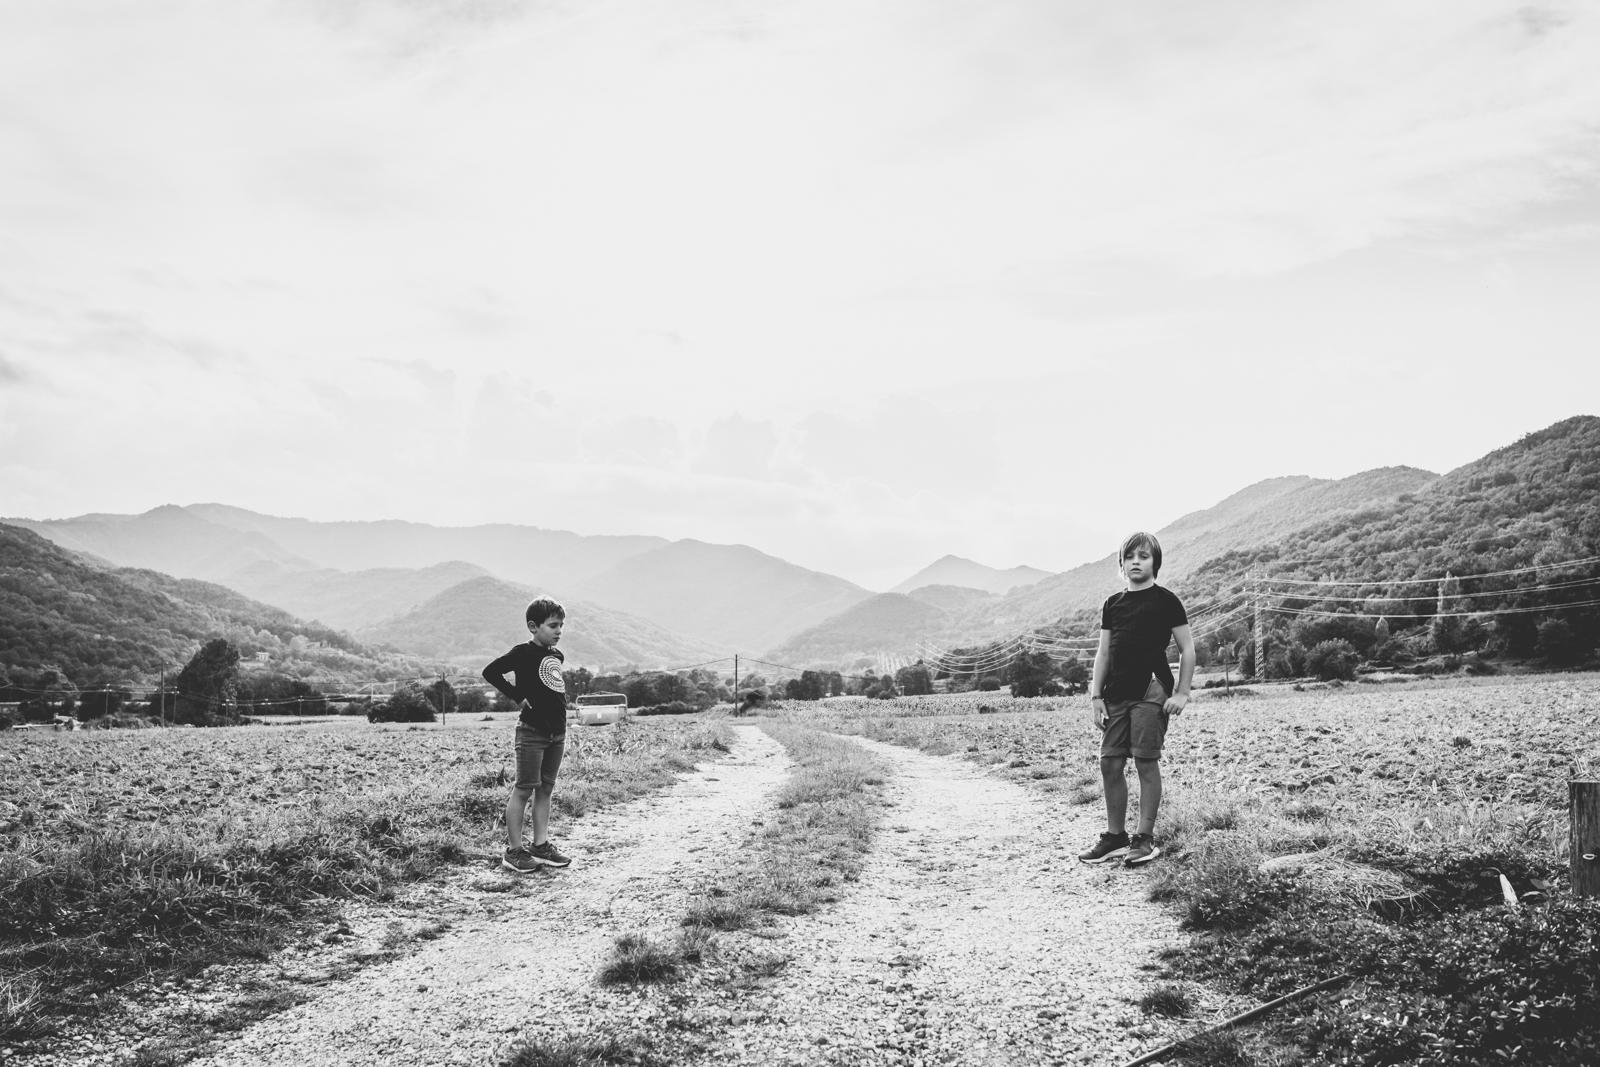 los-niños-del-maiz-family-photographer-barcelona-misshappyflash-2jpg